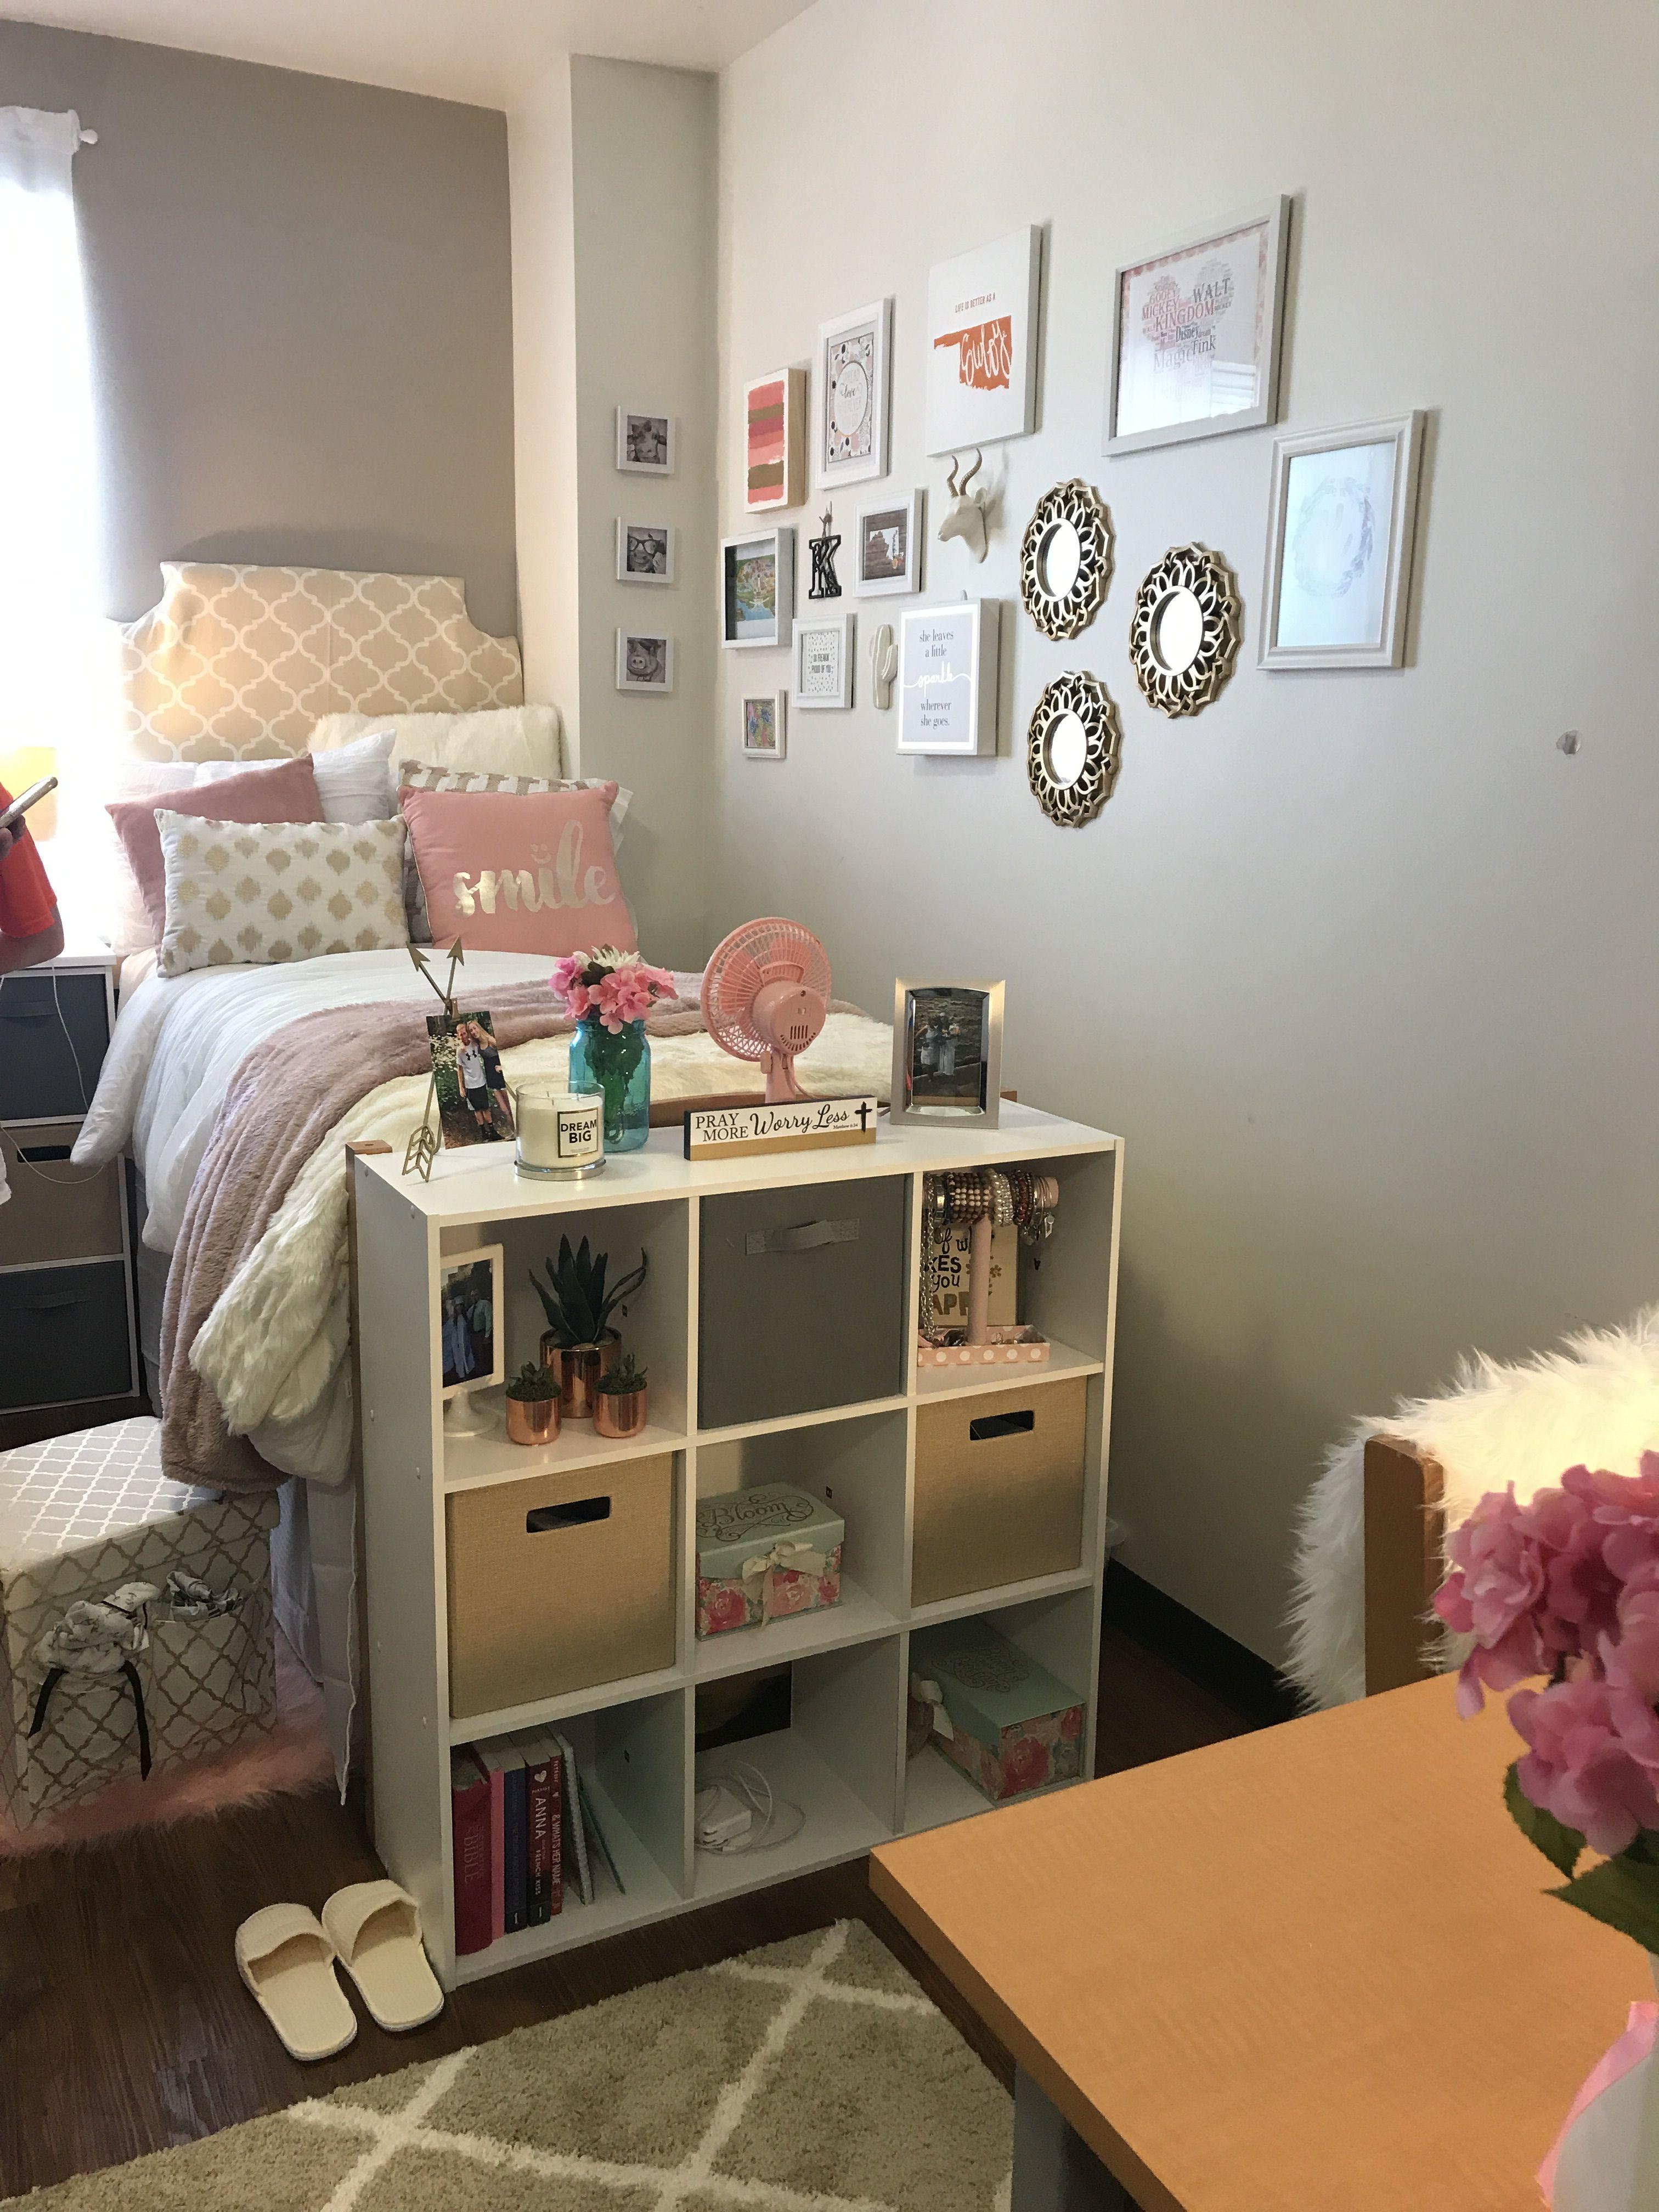 Pinterest Blushedcreation Girl Girls Bedroomideas Bedroom Bedroomdecor Dorm Room Storage Dorm Room Inspiration Dorm Room Diy